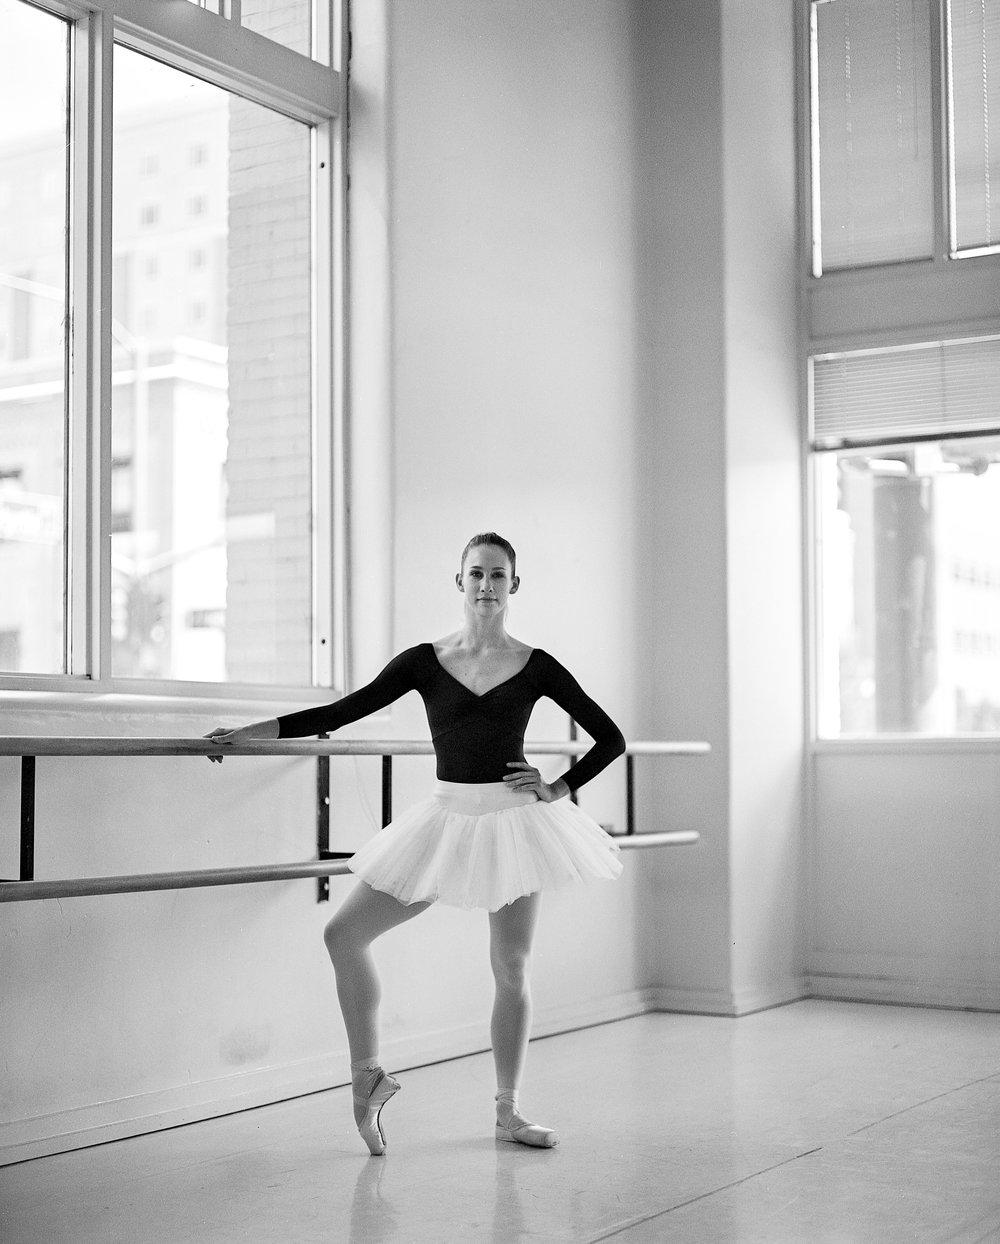 Jessica_Ballet-25.JPG